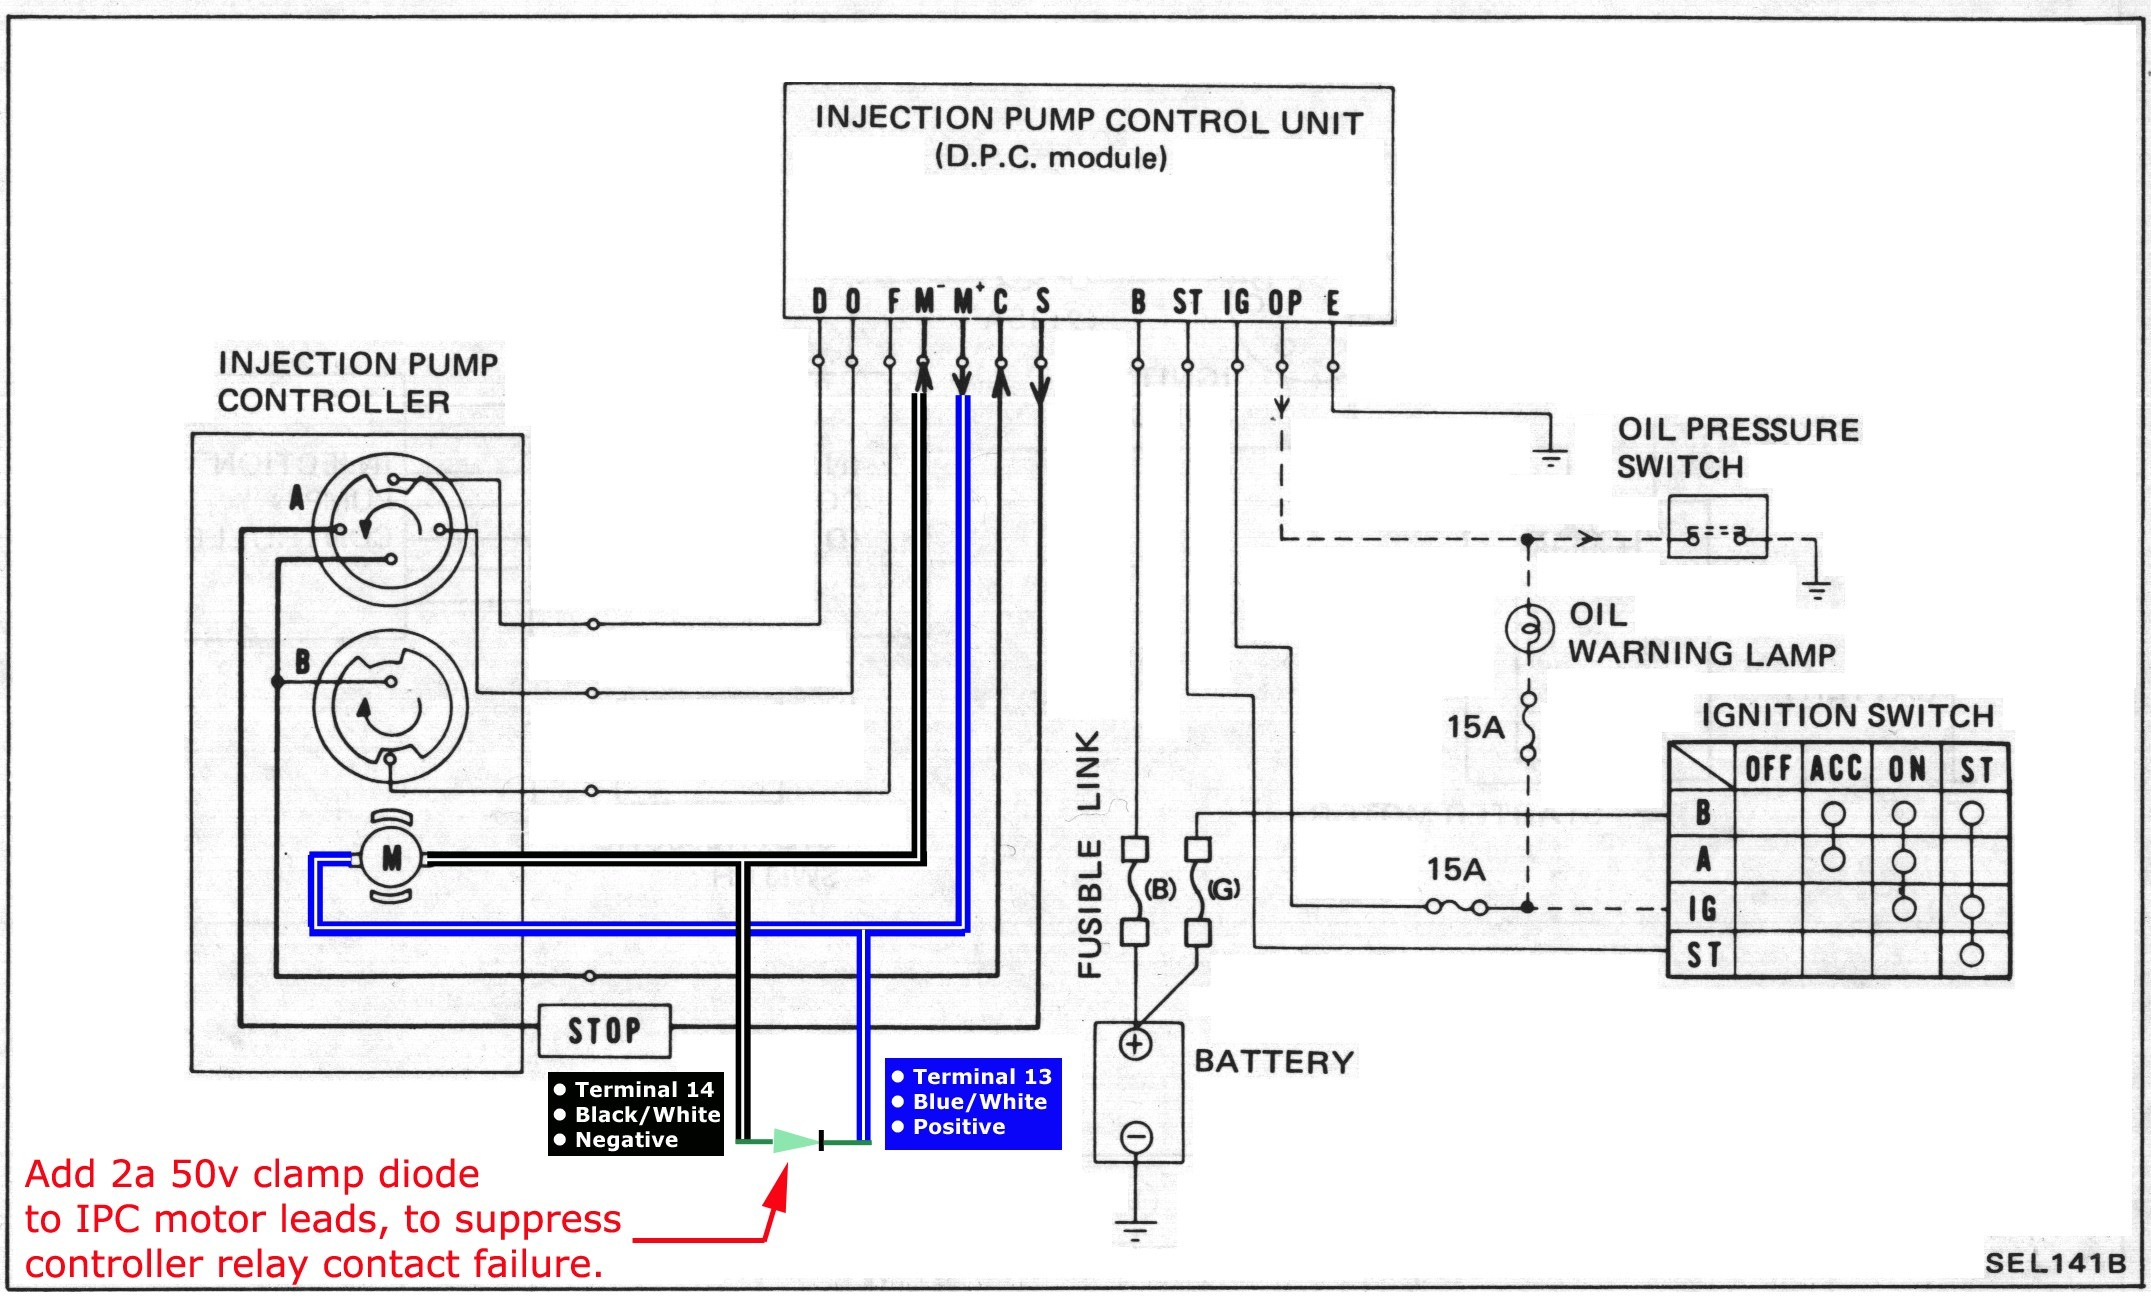 2010 Nissan Altima Engine Diagram Nissan Maxima Engine Diagram Moreover Nissan  Altima Engine Diagram